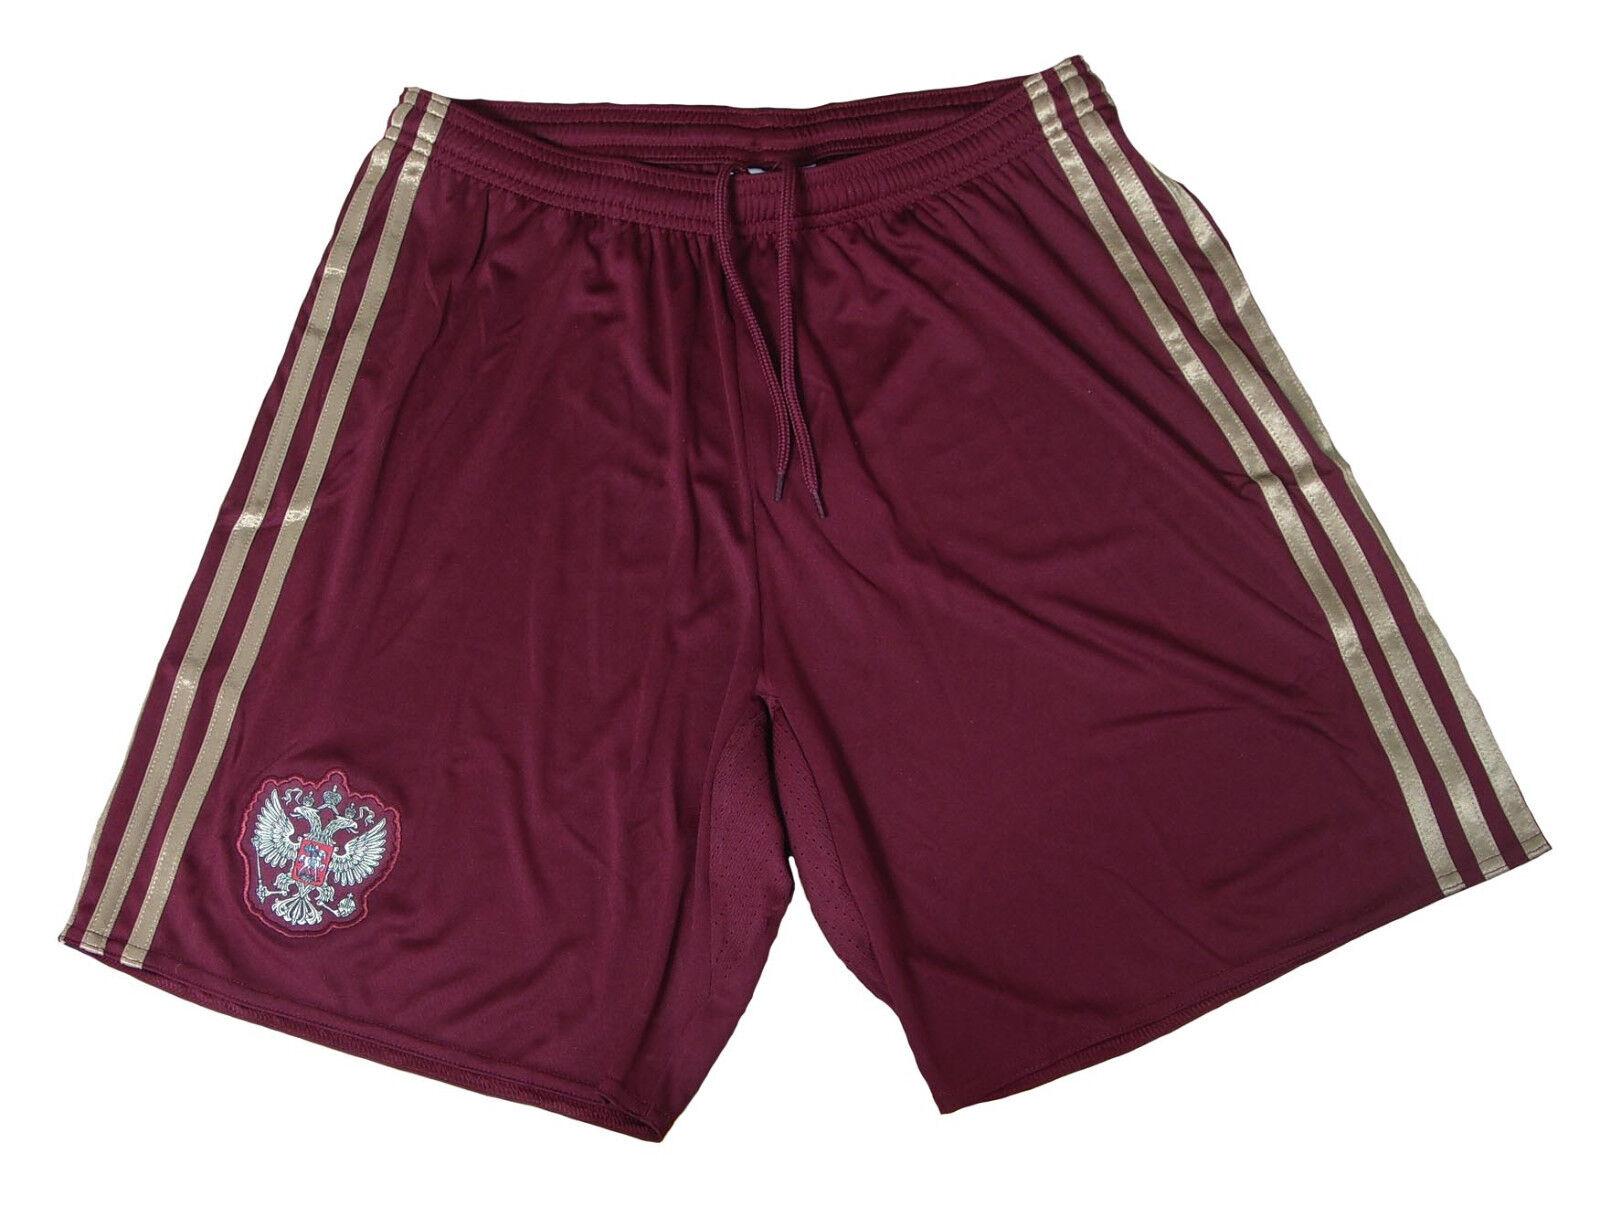 Russland RFU Shorts/Short Trikot Hose 2016 Home Adidas S L XL